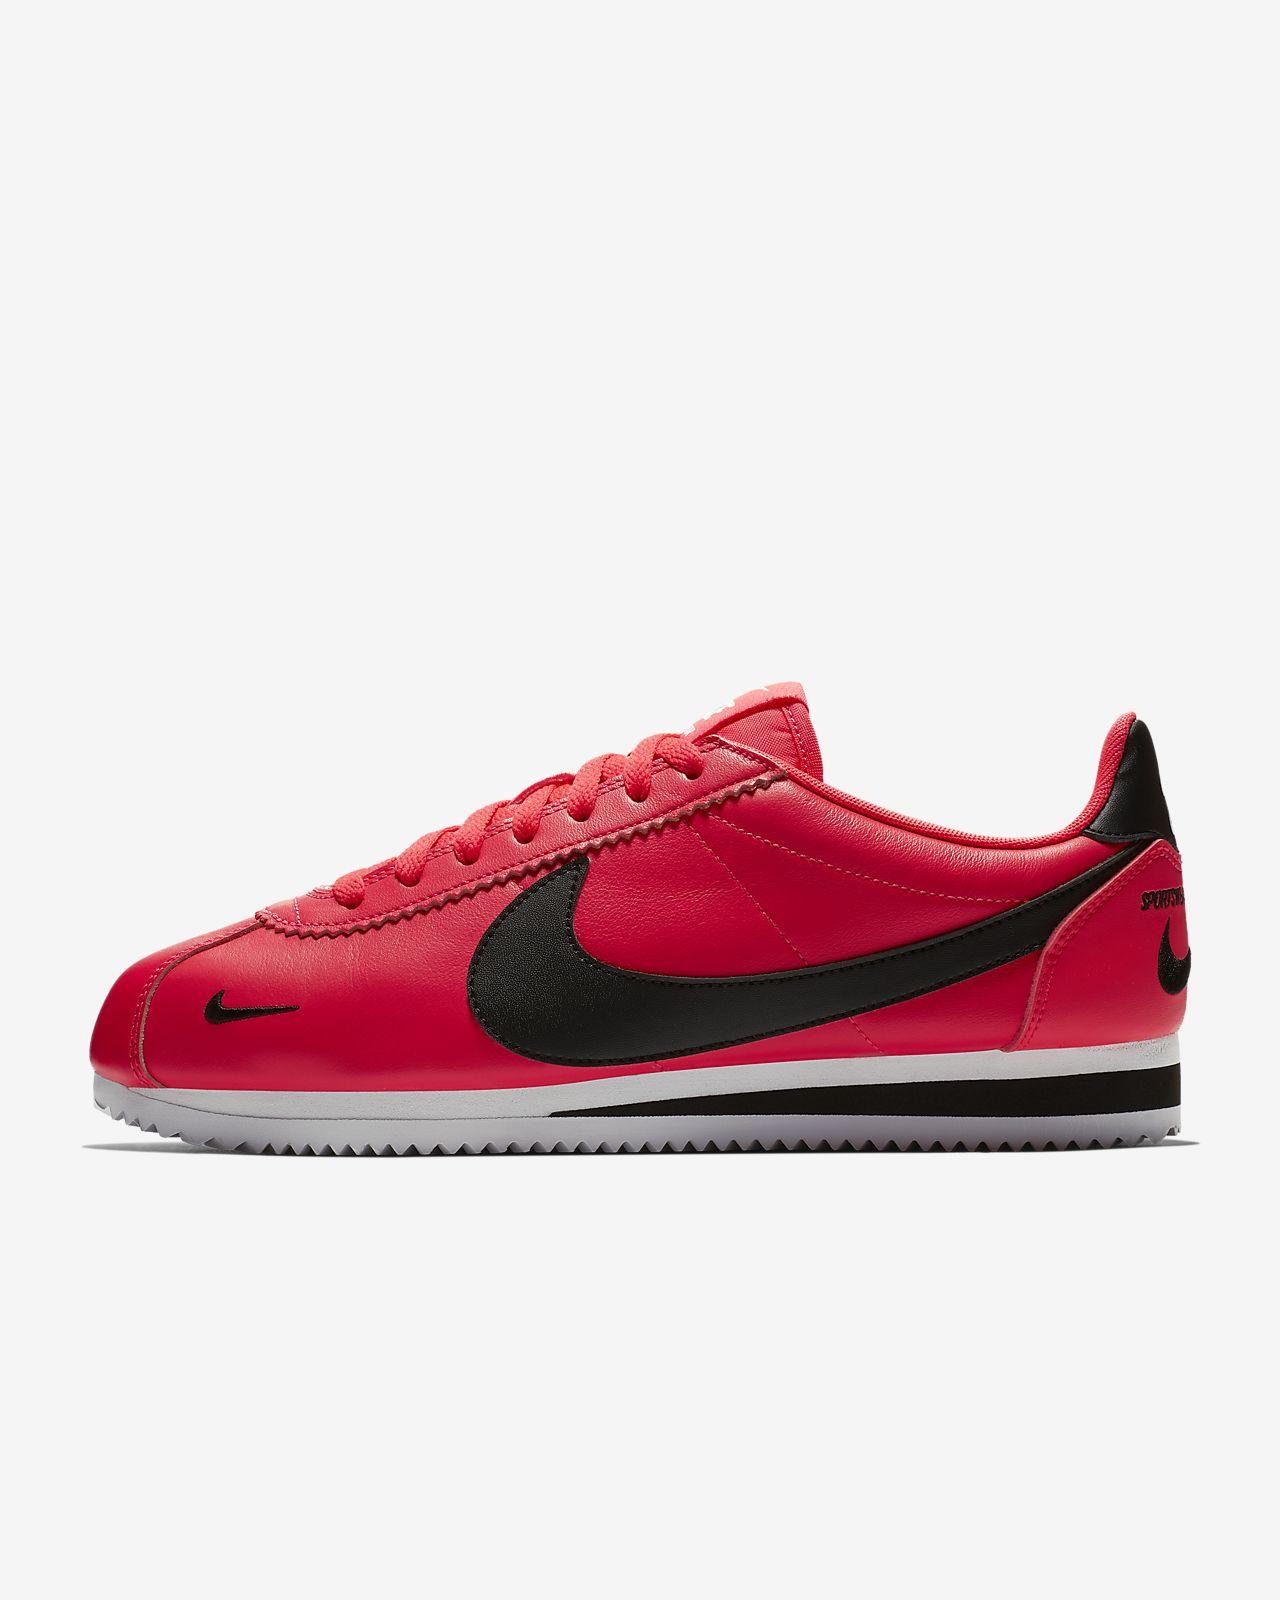 198f43c31e06 Chaussure Cortez Classic Nike Be Premium Mixte HgrqxSwnH